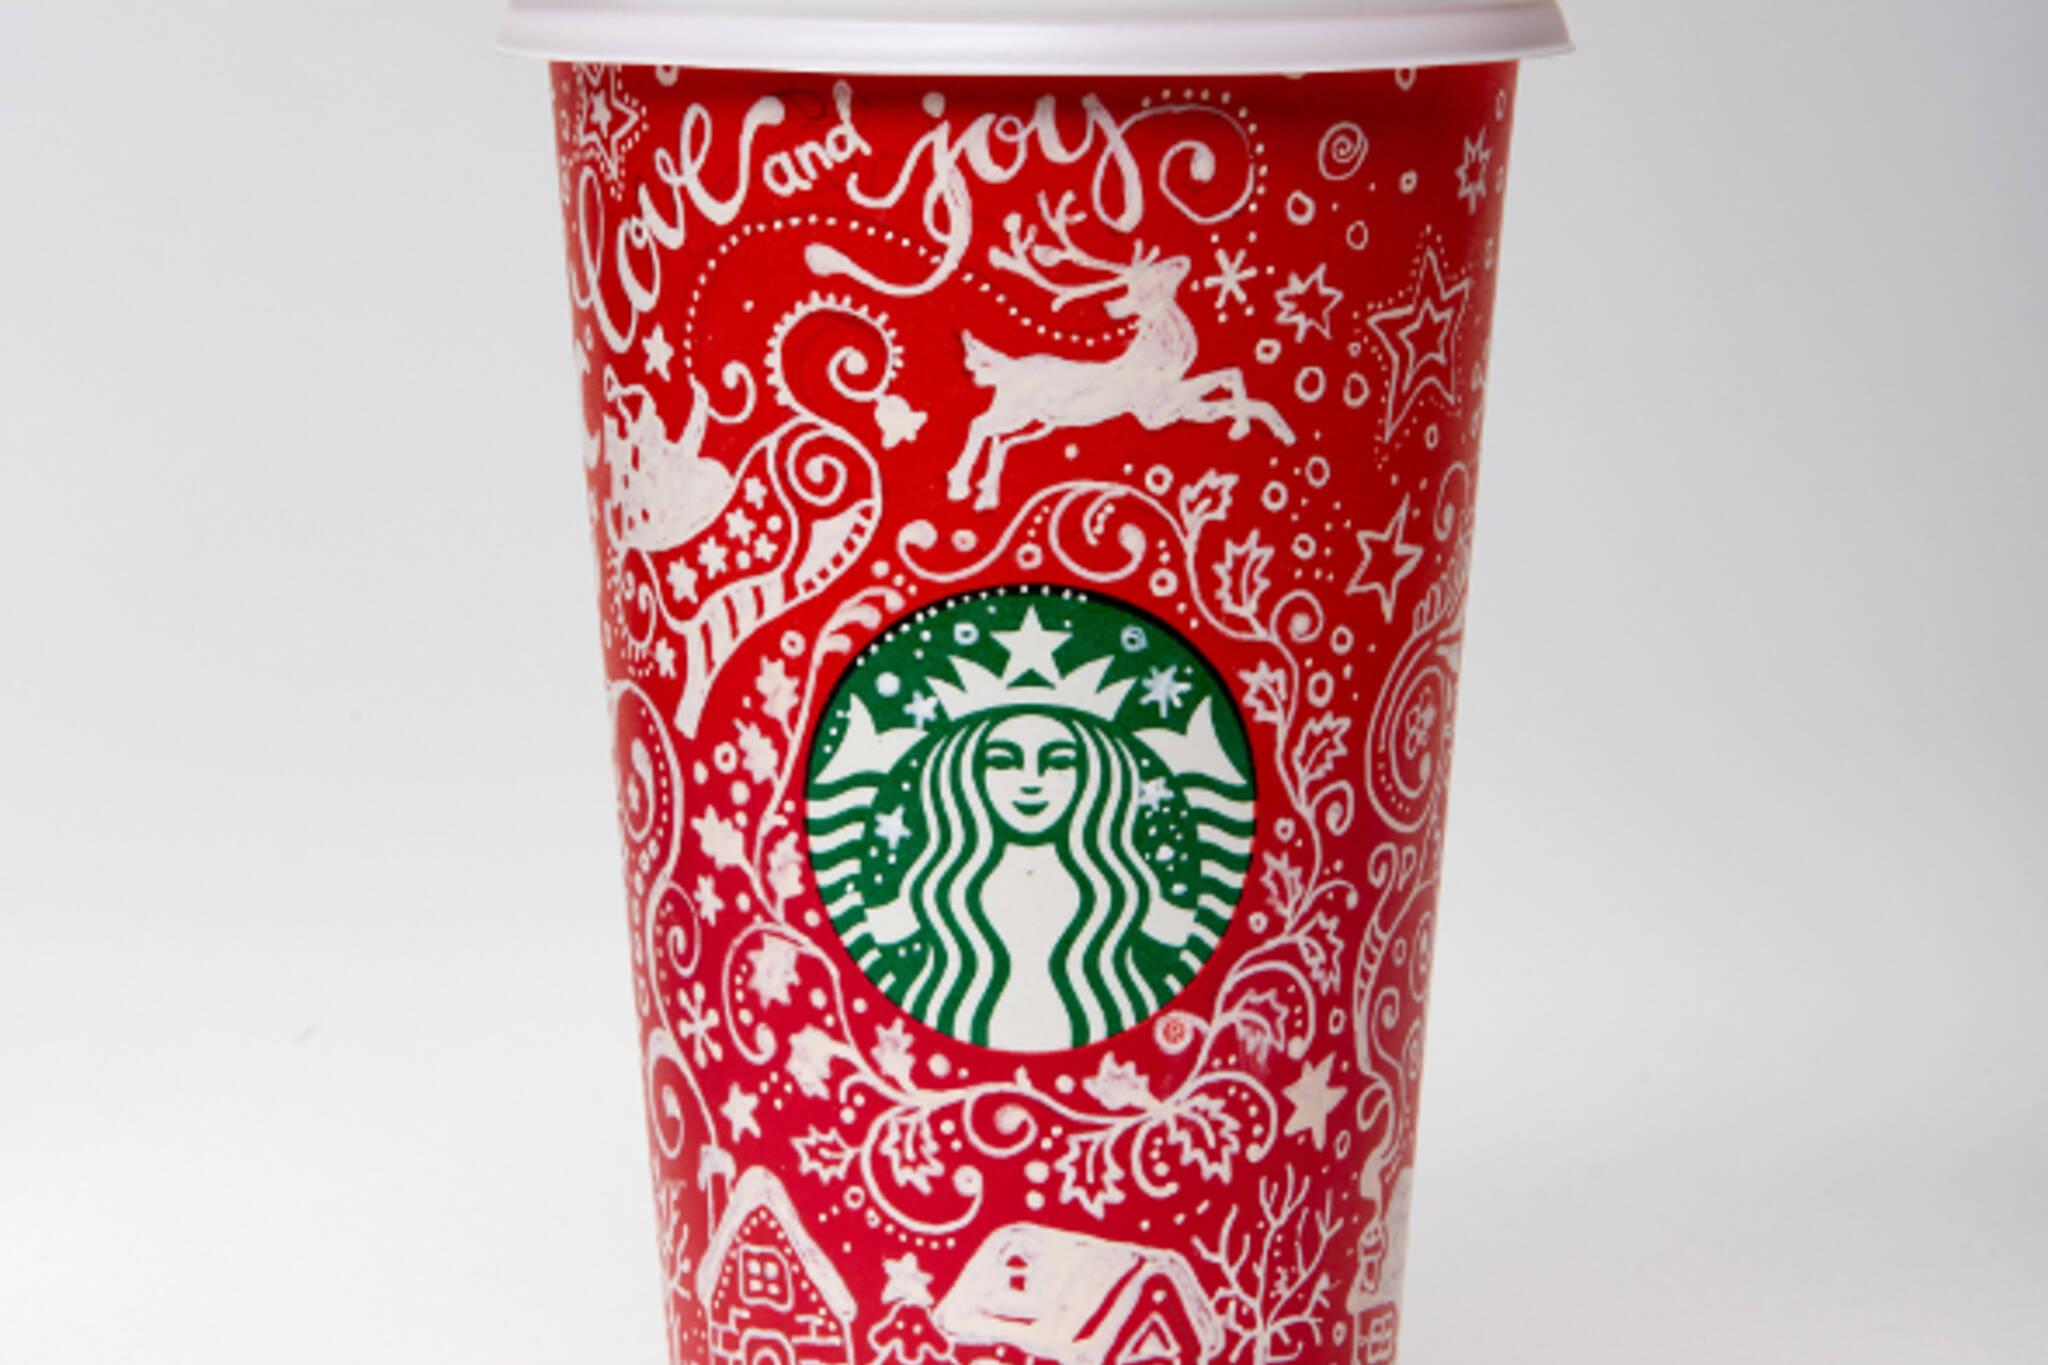 starbucks red cup toronto